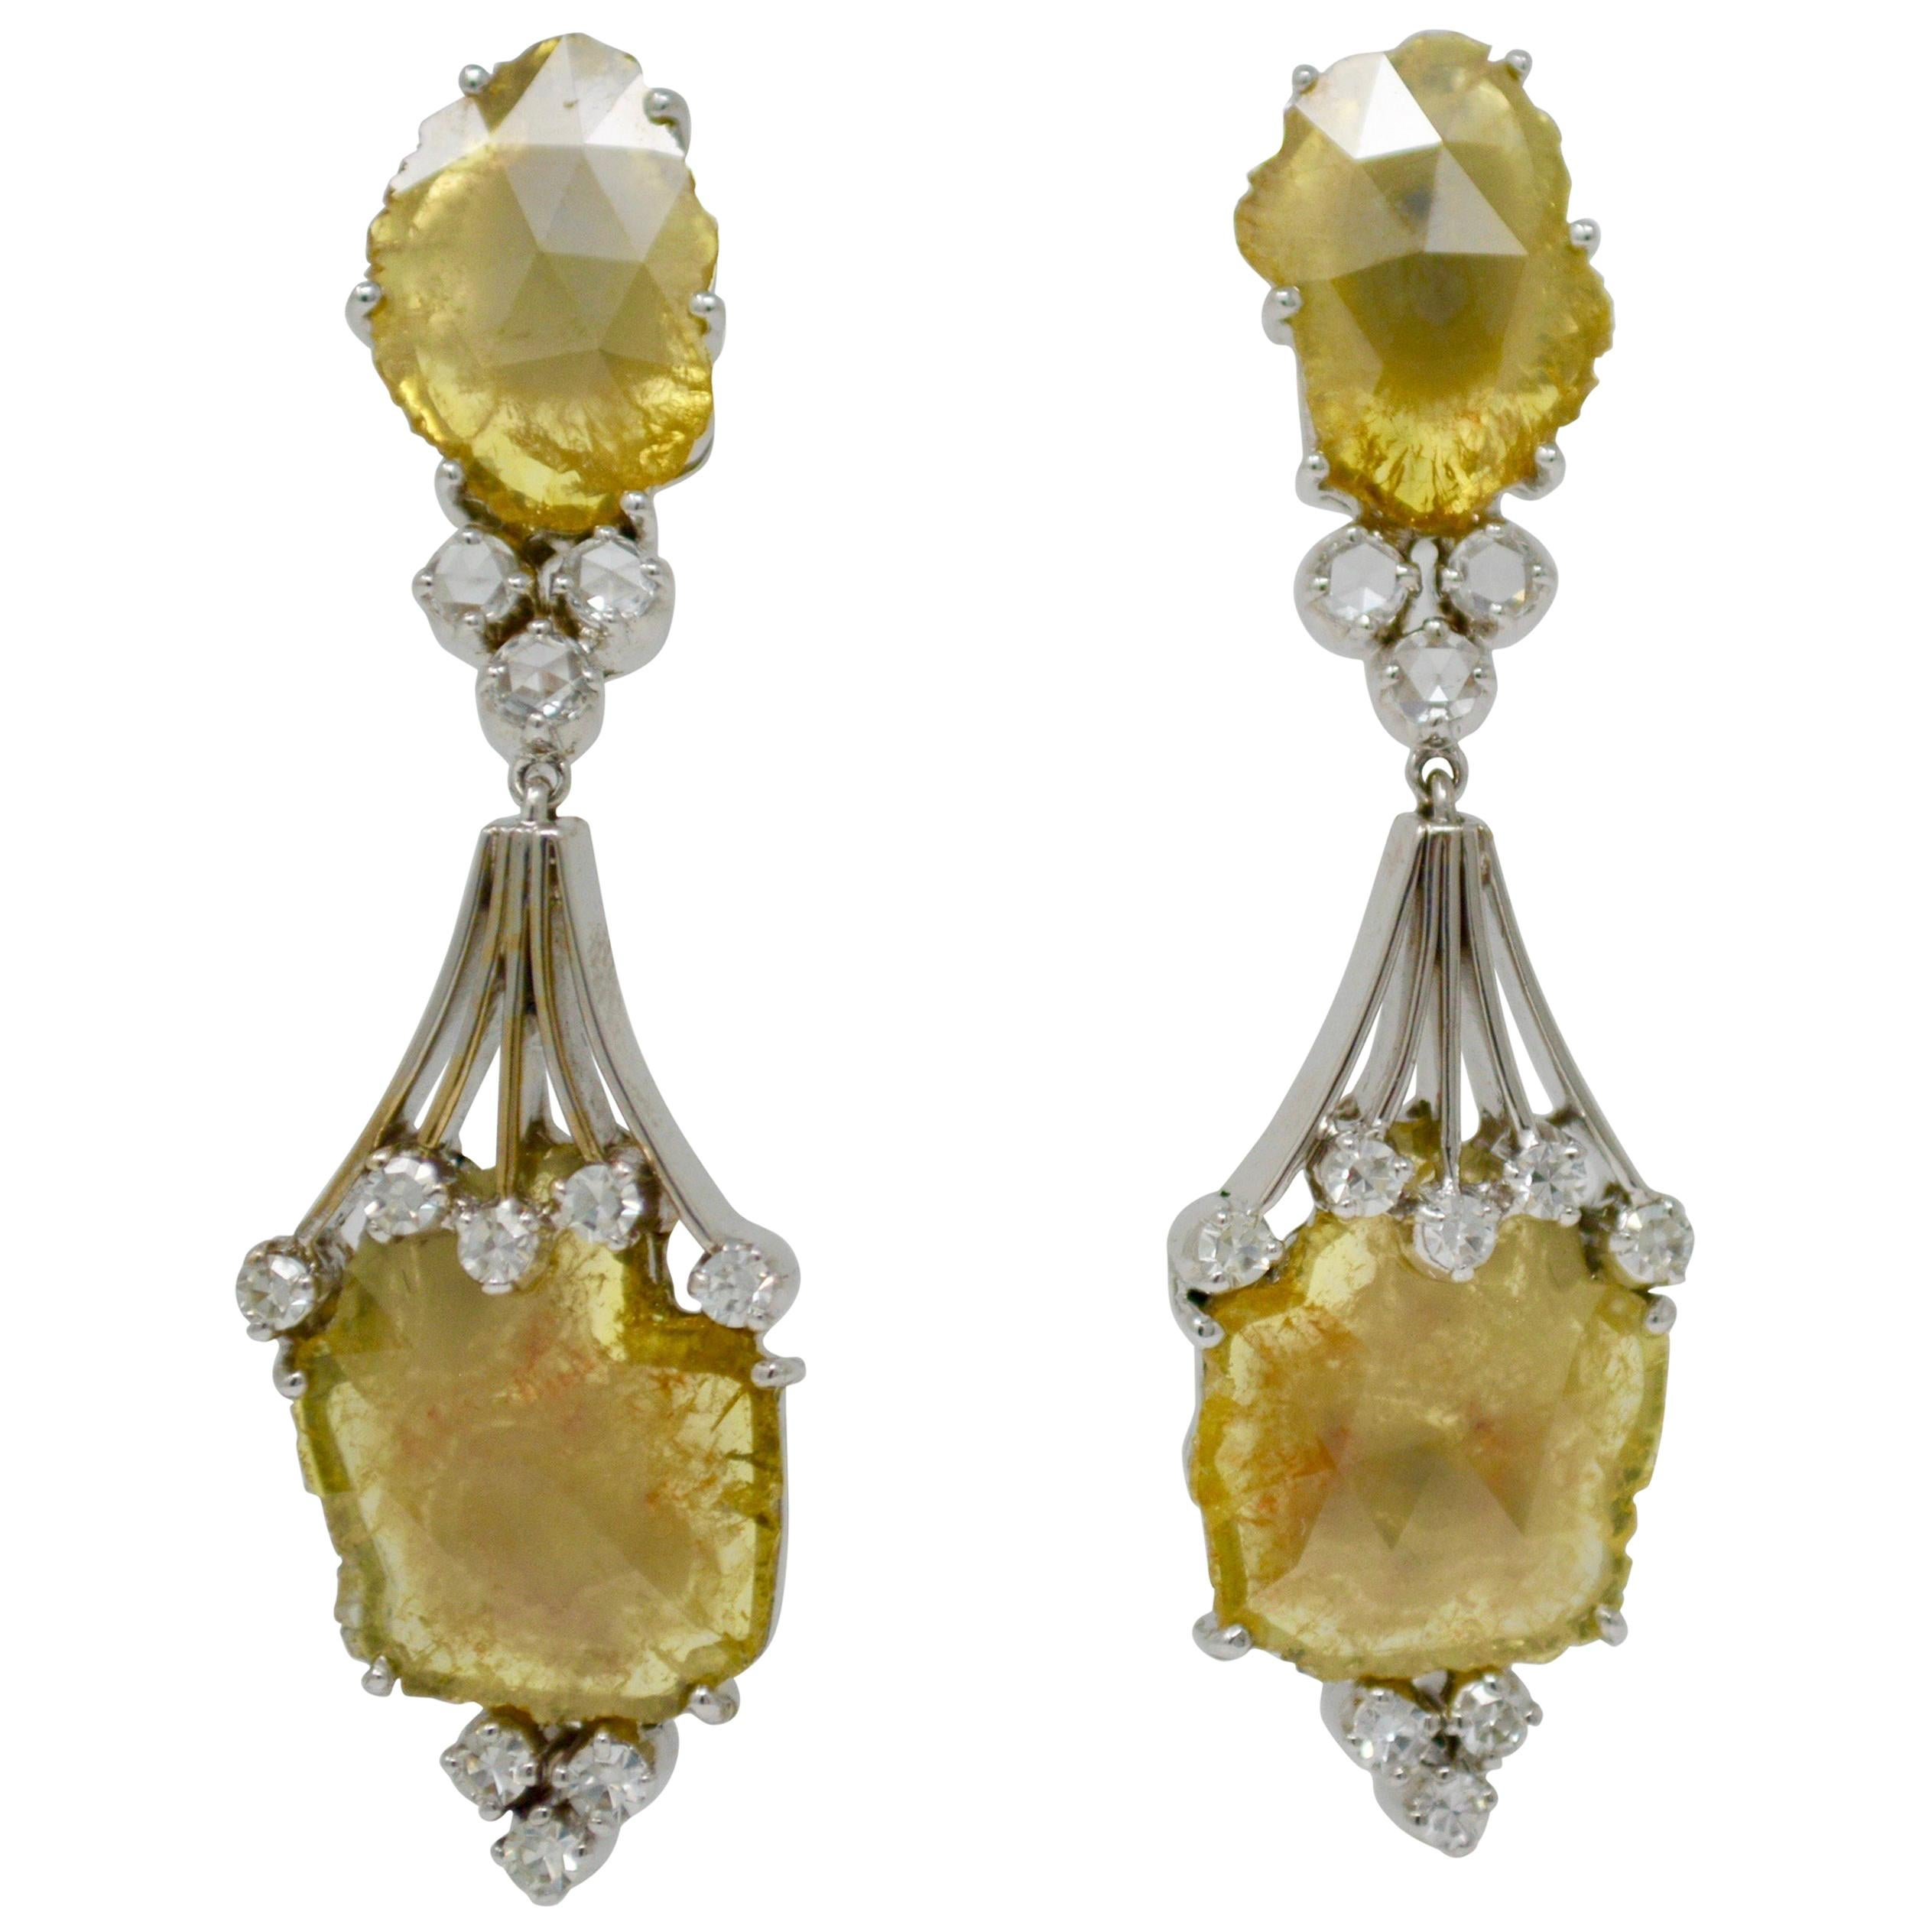 1f0517e74aa1 7.98 Carat Natural Yellow Slice Diamond Earrings